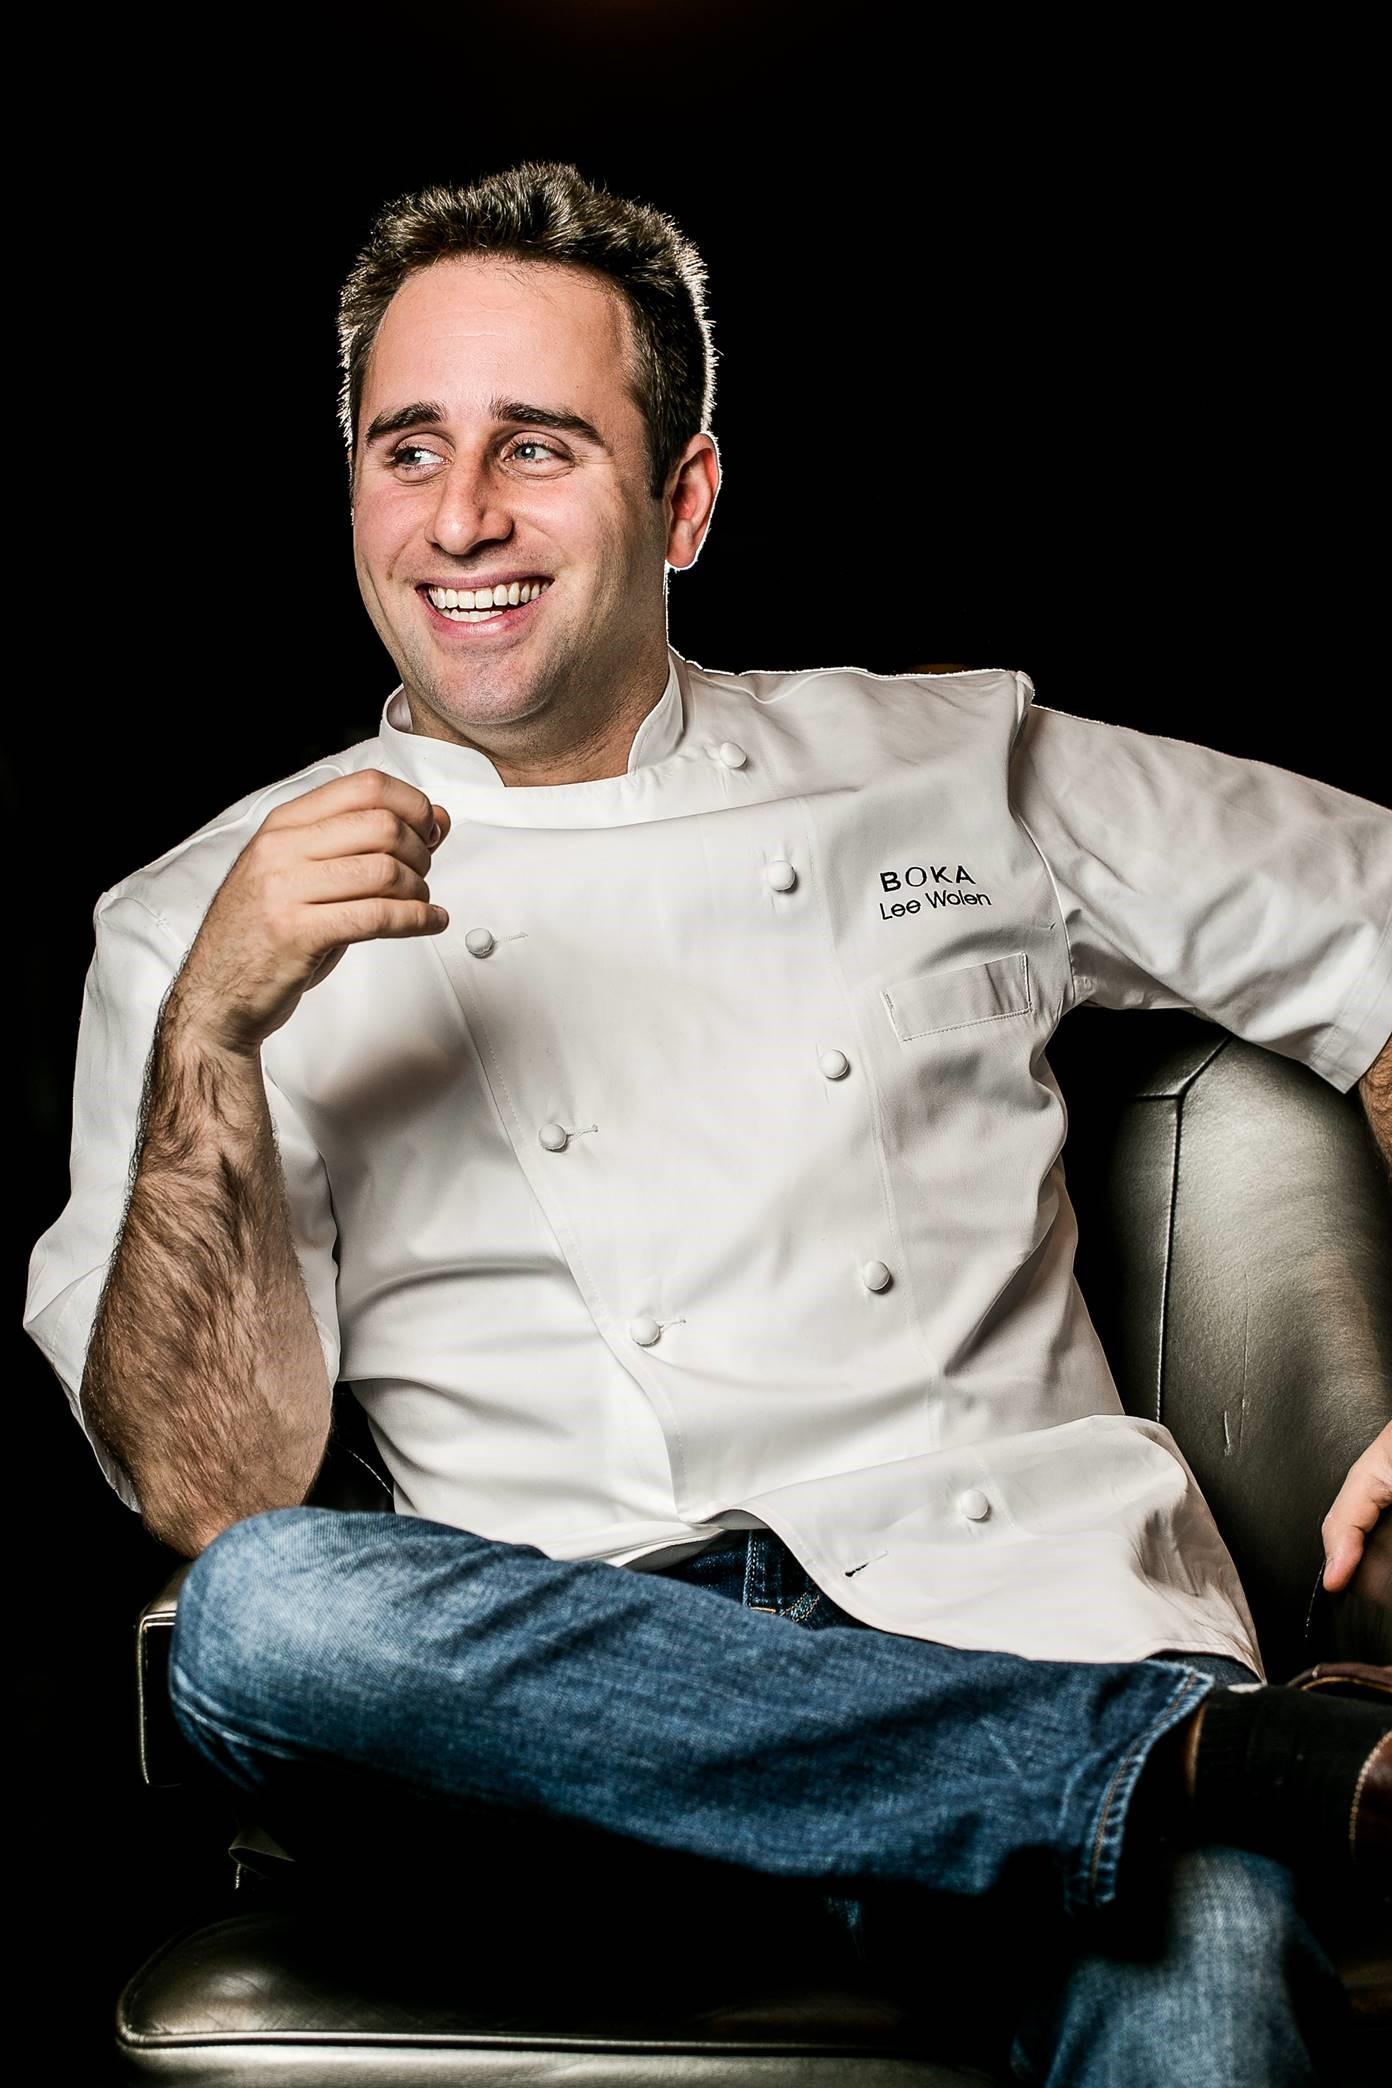 Executive Chef/Partner Lee Wolen